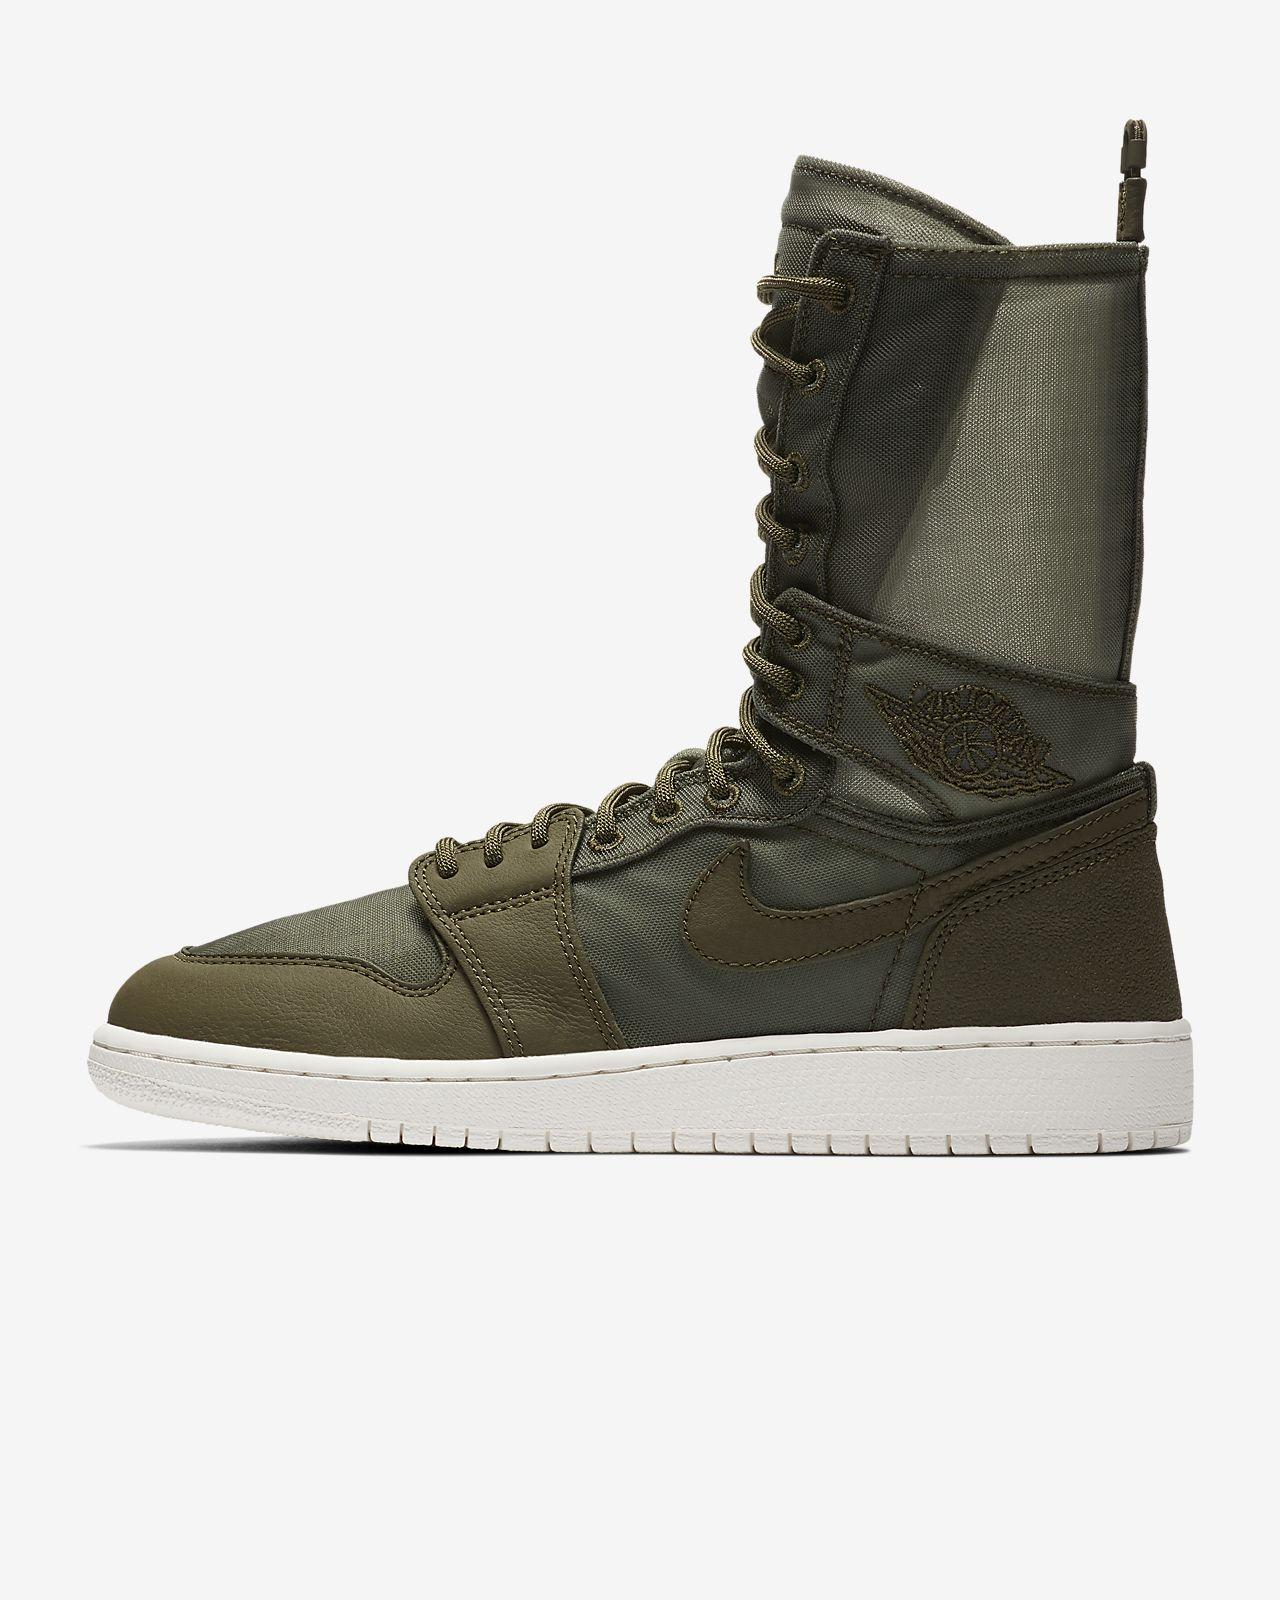 Air Jordan 1 Explorer XX női cipő